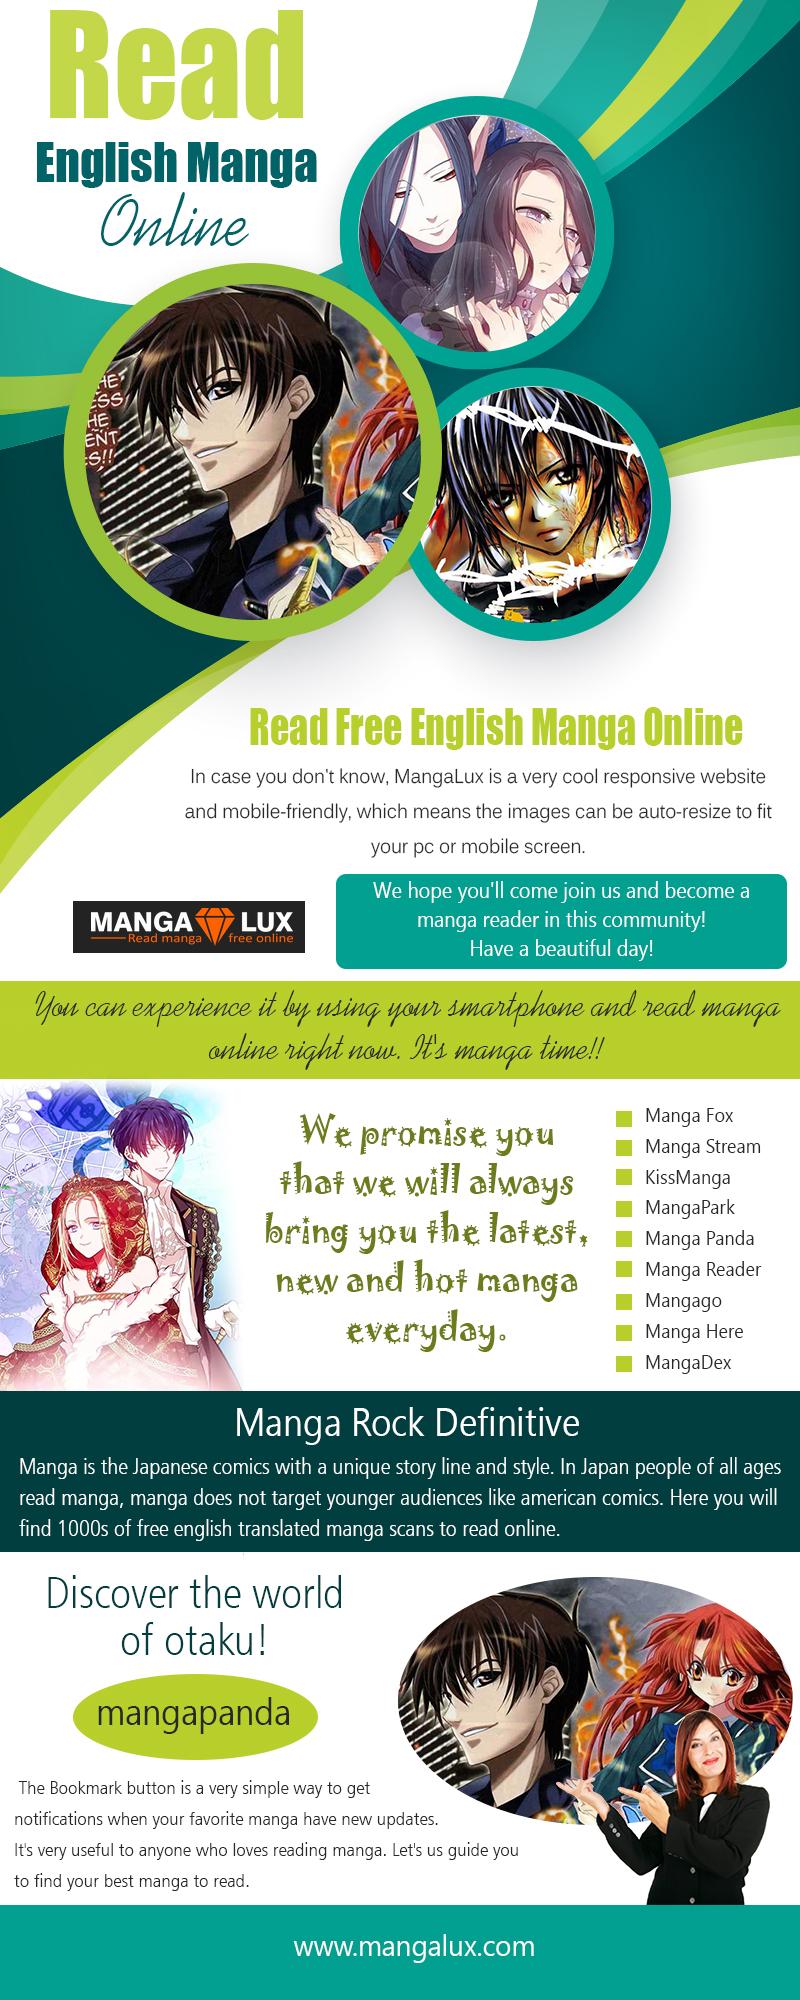 Read English Manga Online